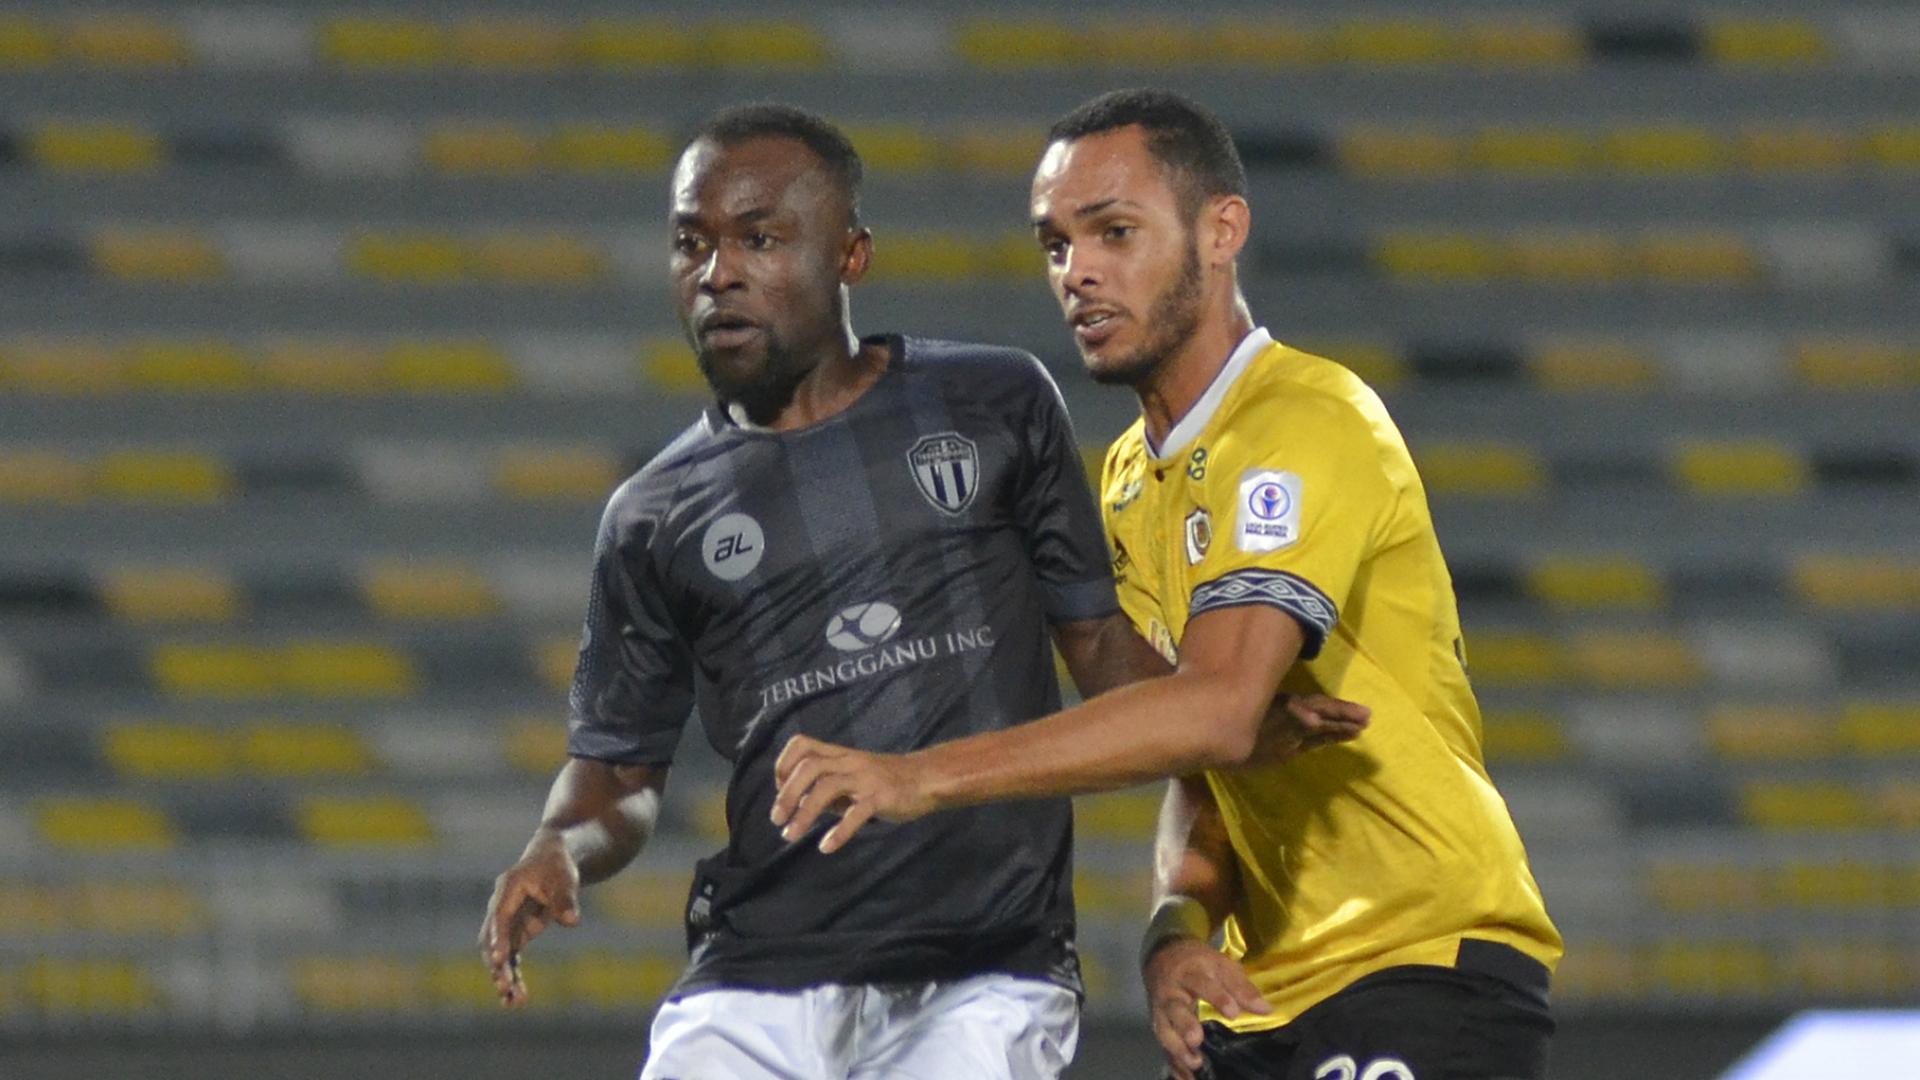 Dechi Marcel, Perak v Terengganu FC, Malaysia Super League, 18 Jun 2019